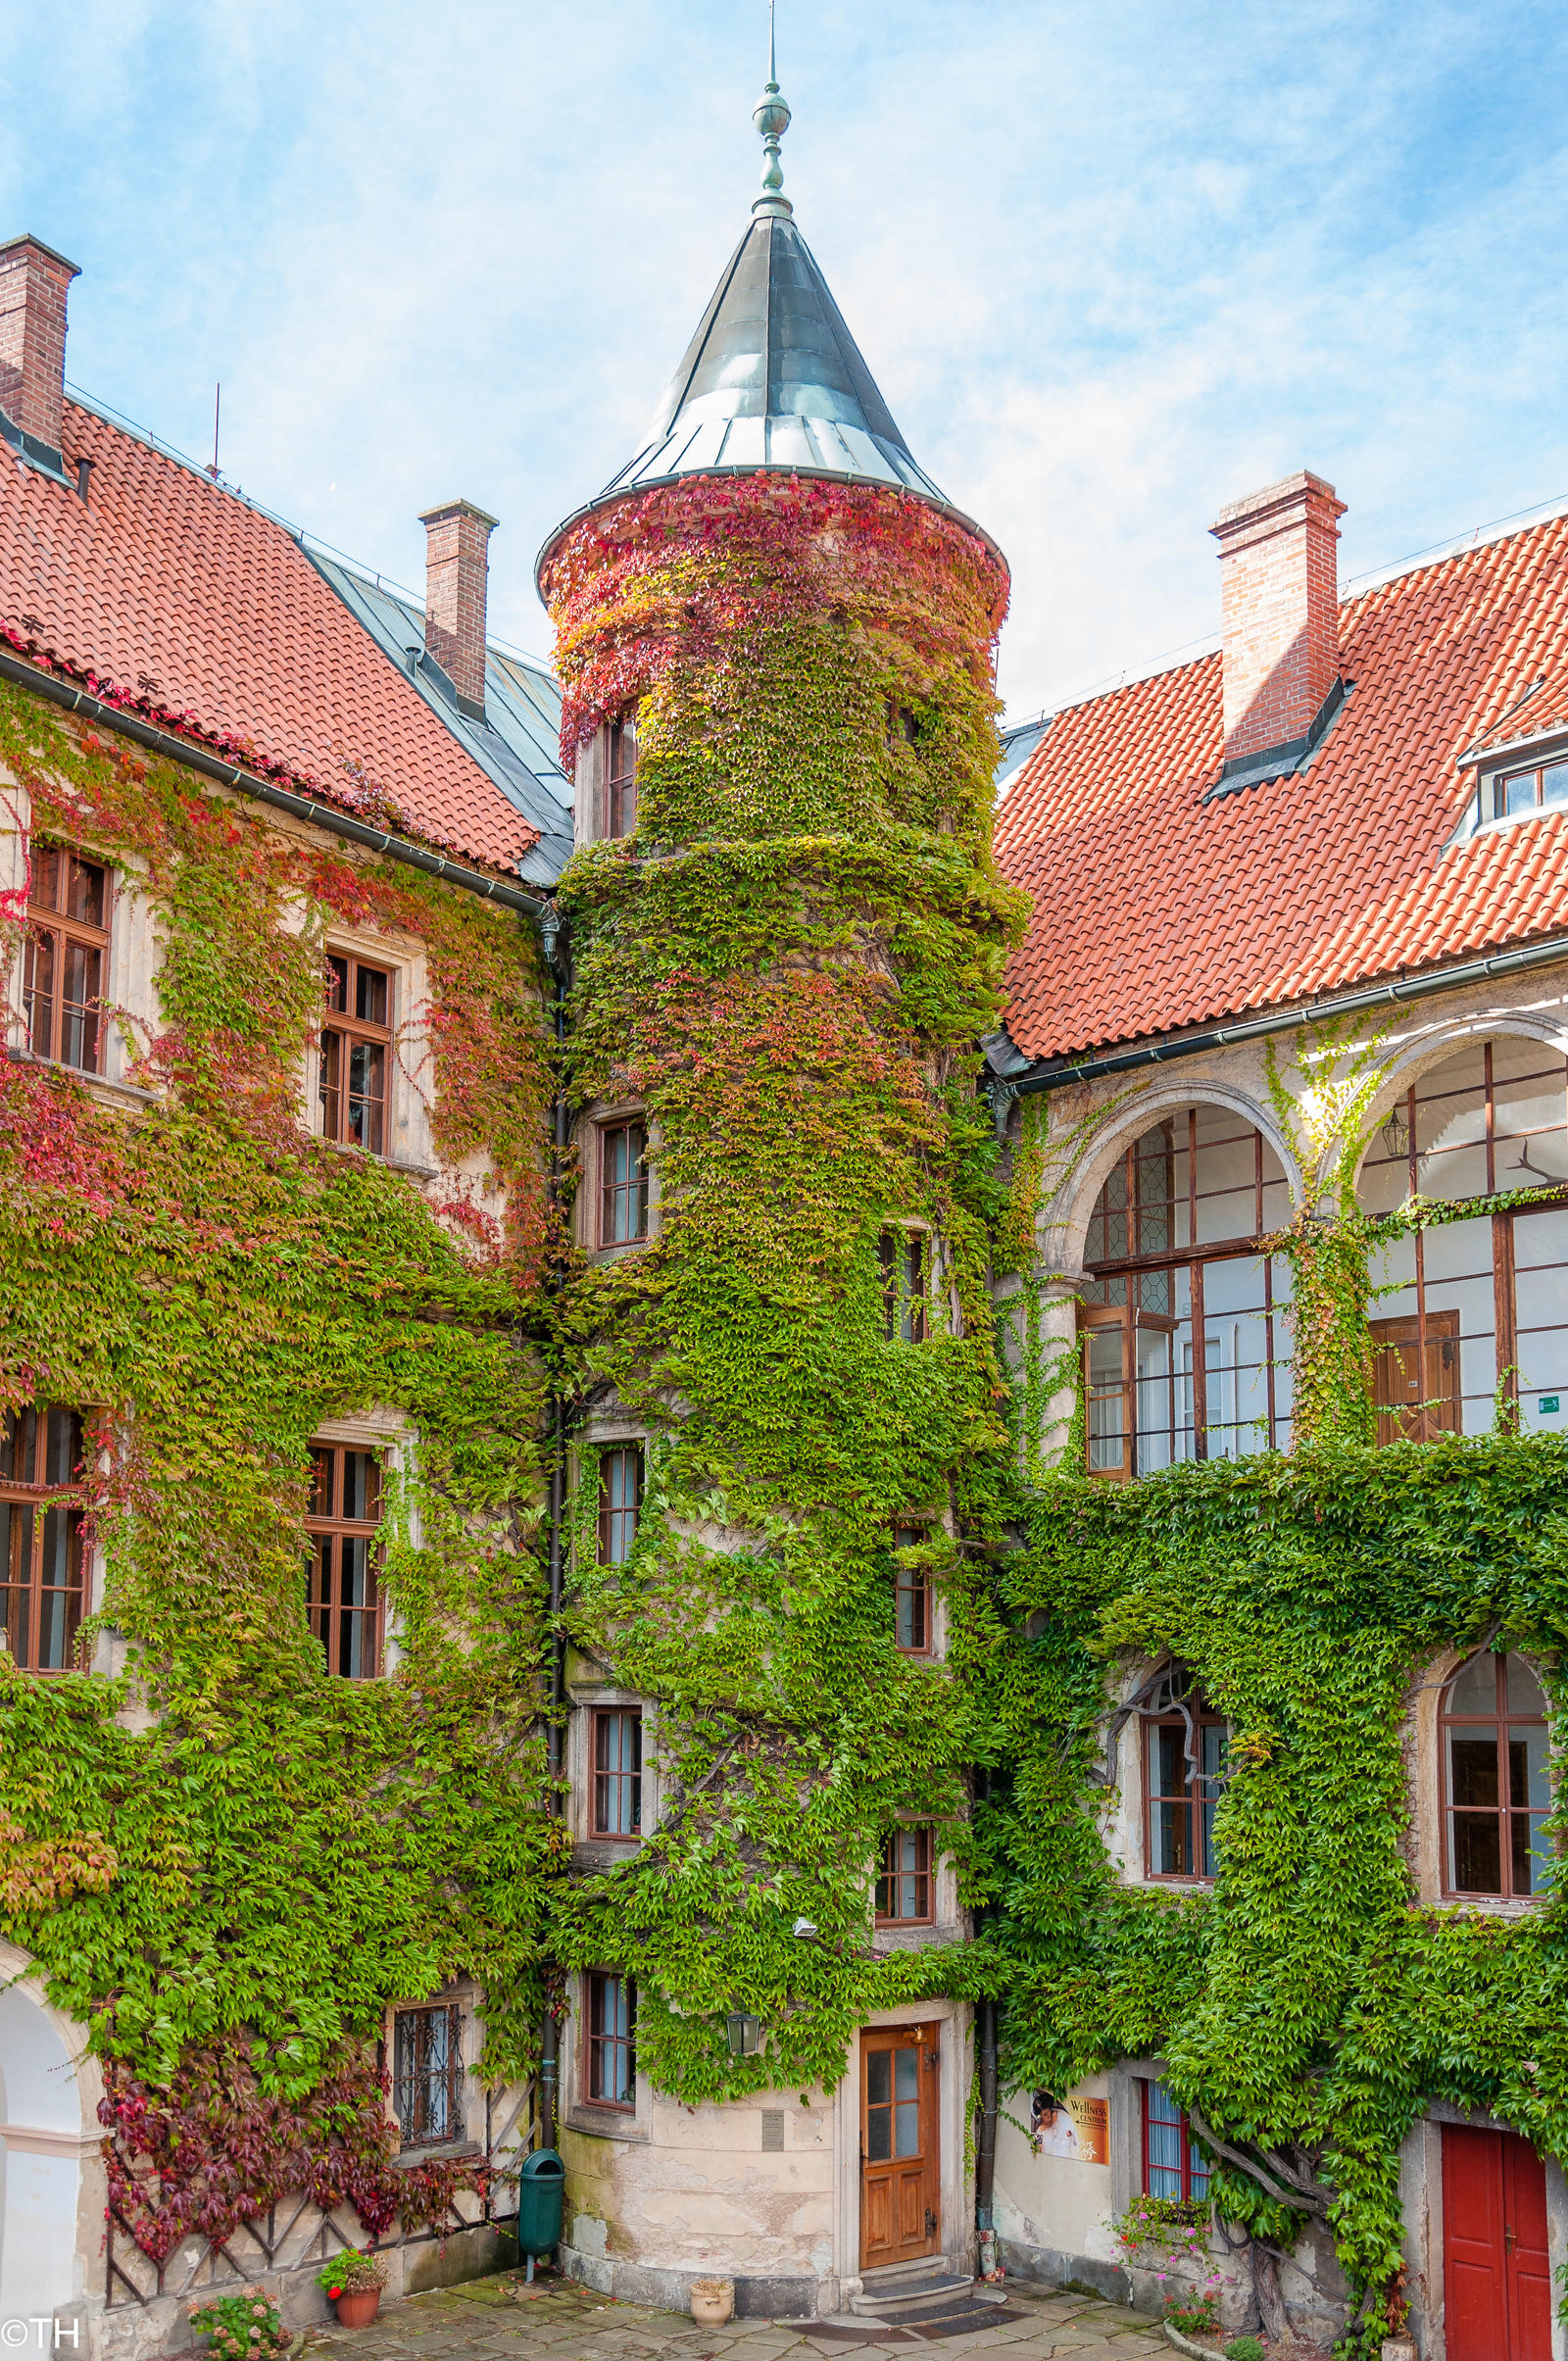 Castle Hruba Skala by Zajdaz